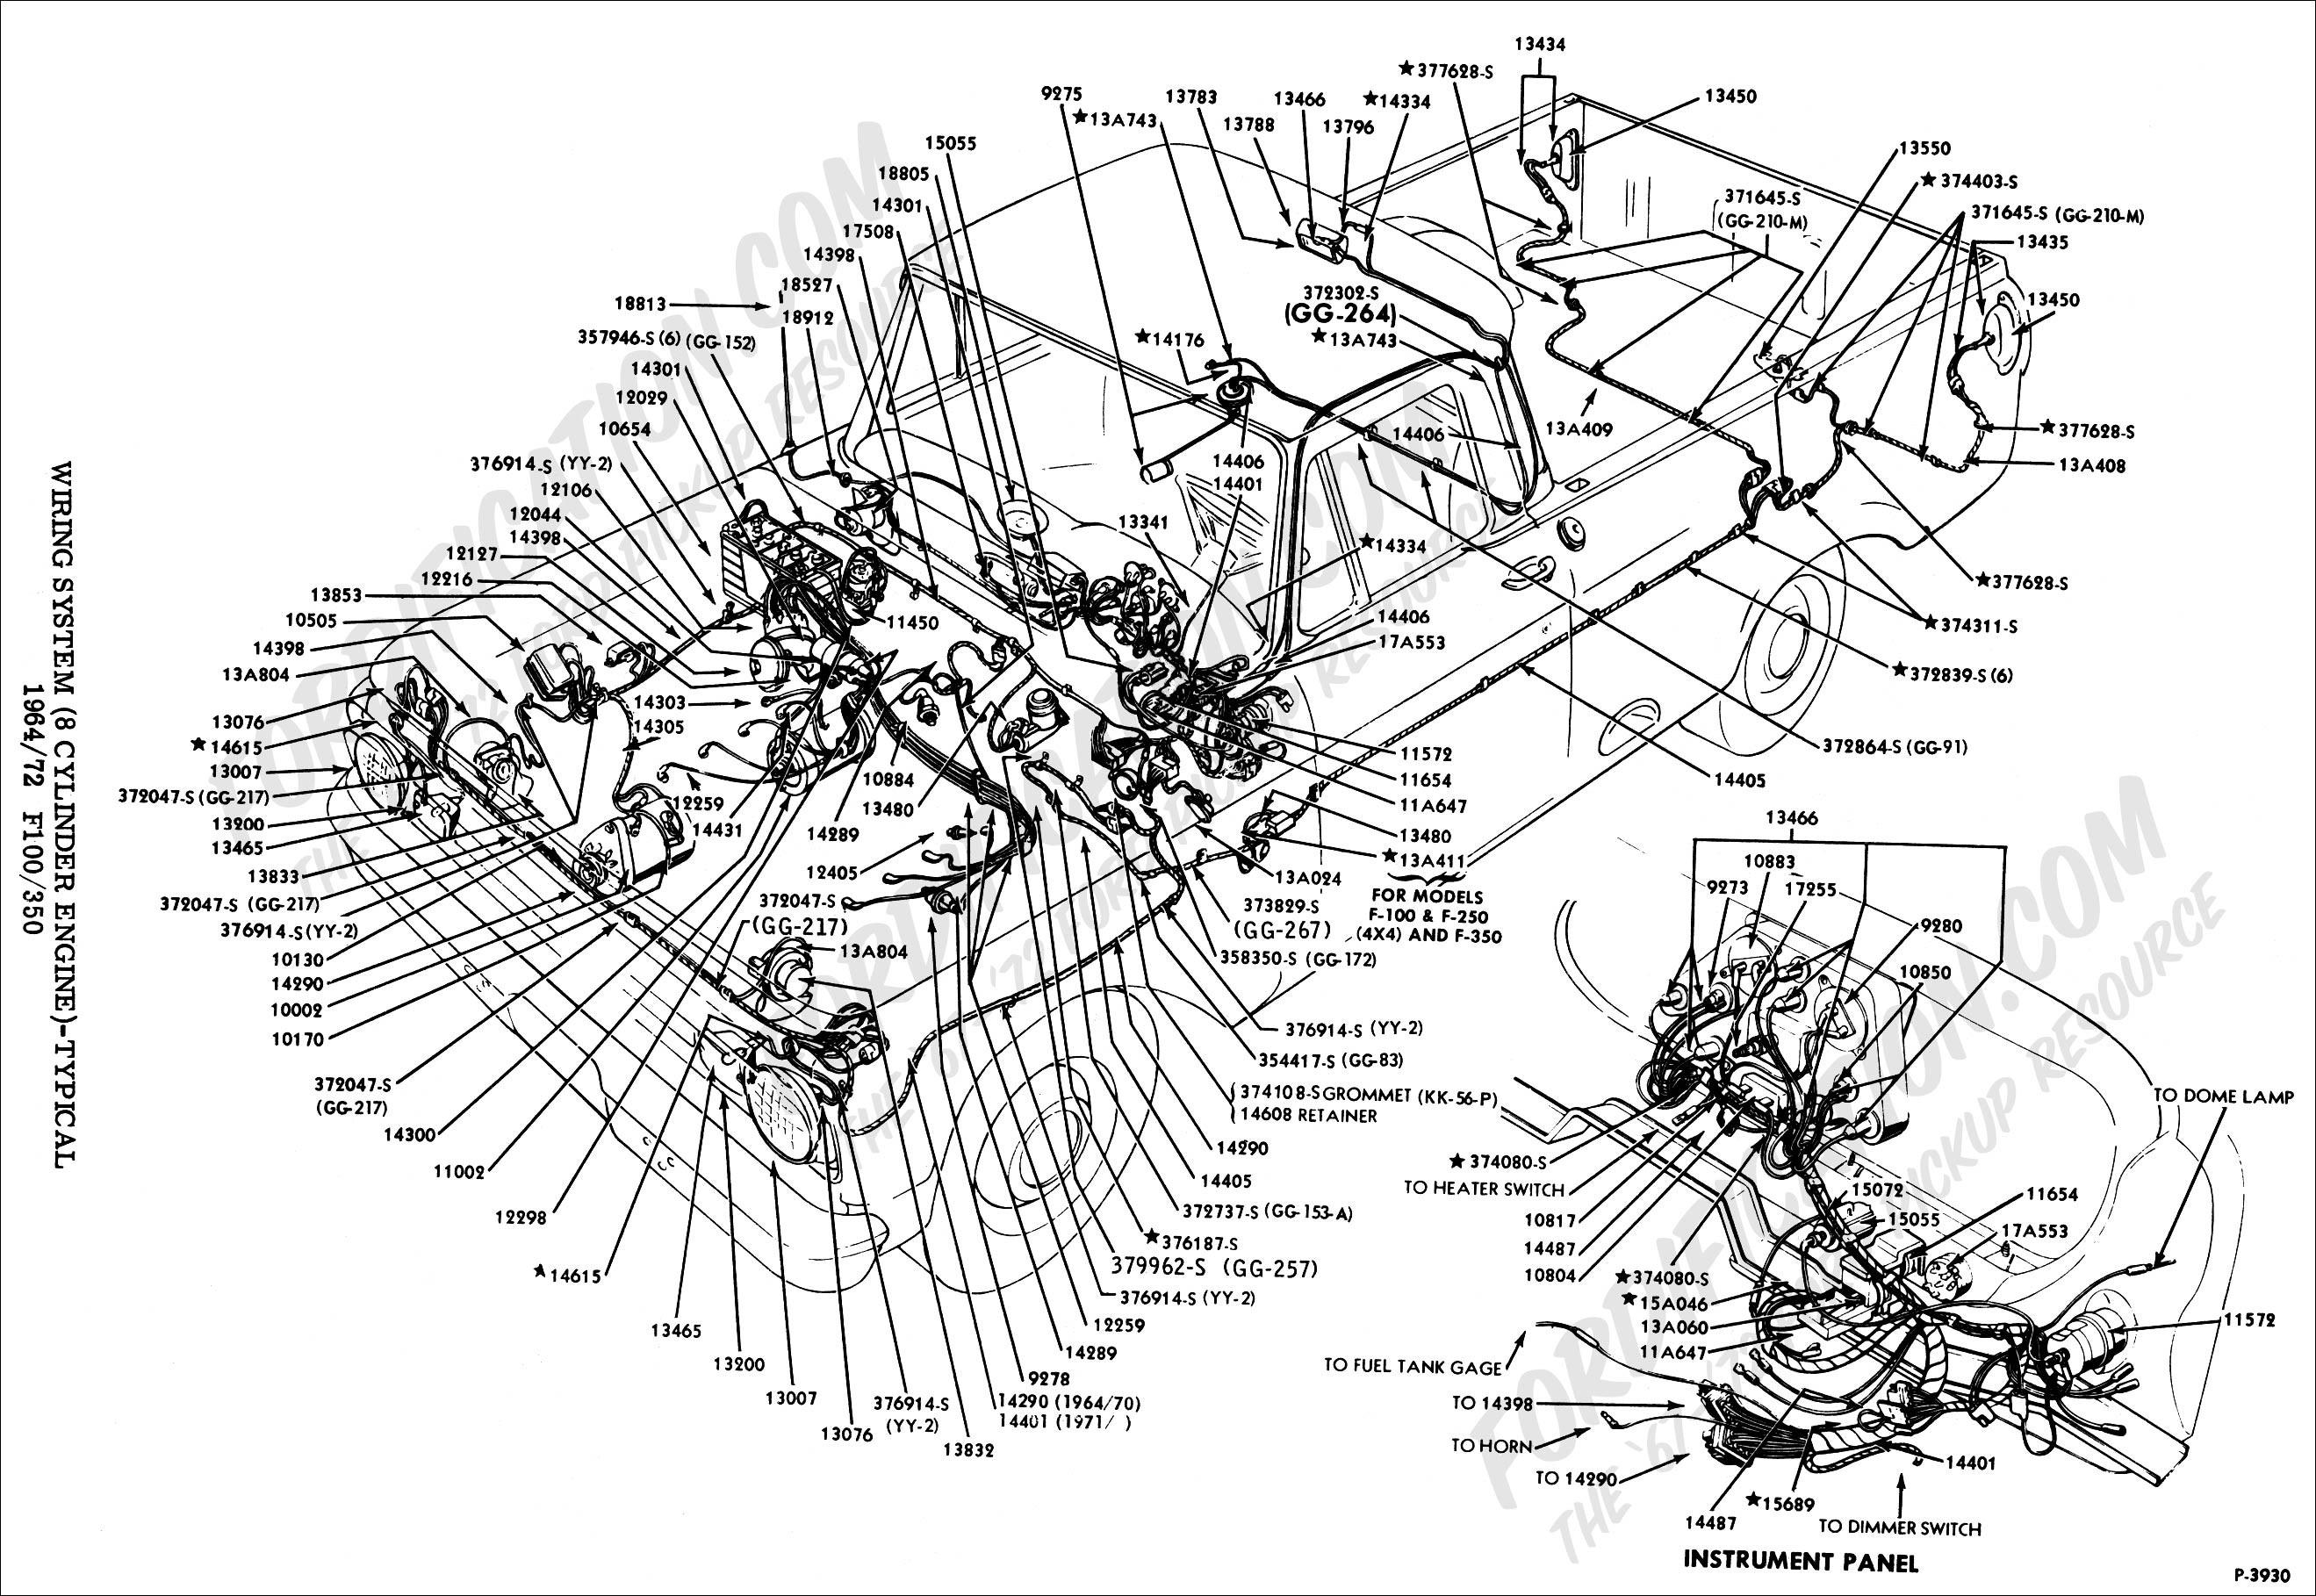 1999 ford Expedition Engine Diagram F 250 Engine Diagram Layout Wiring Diagrams • Of 1999 ford Expedition Engine Diagram